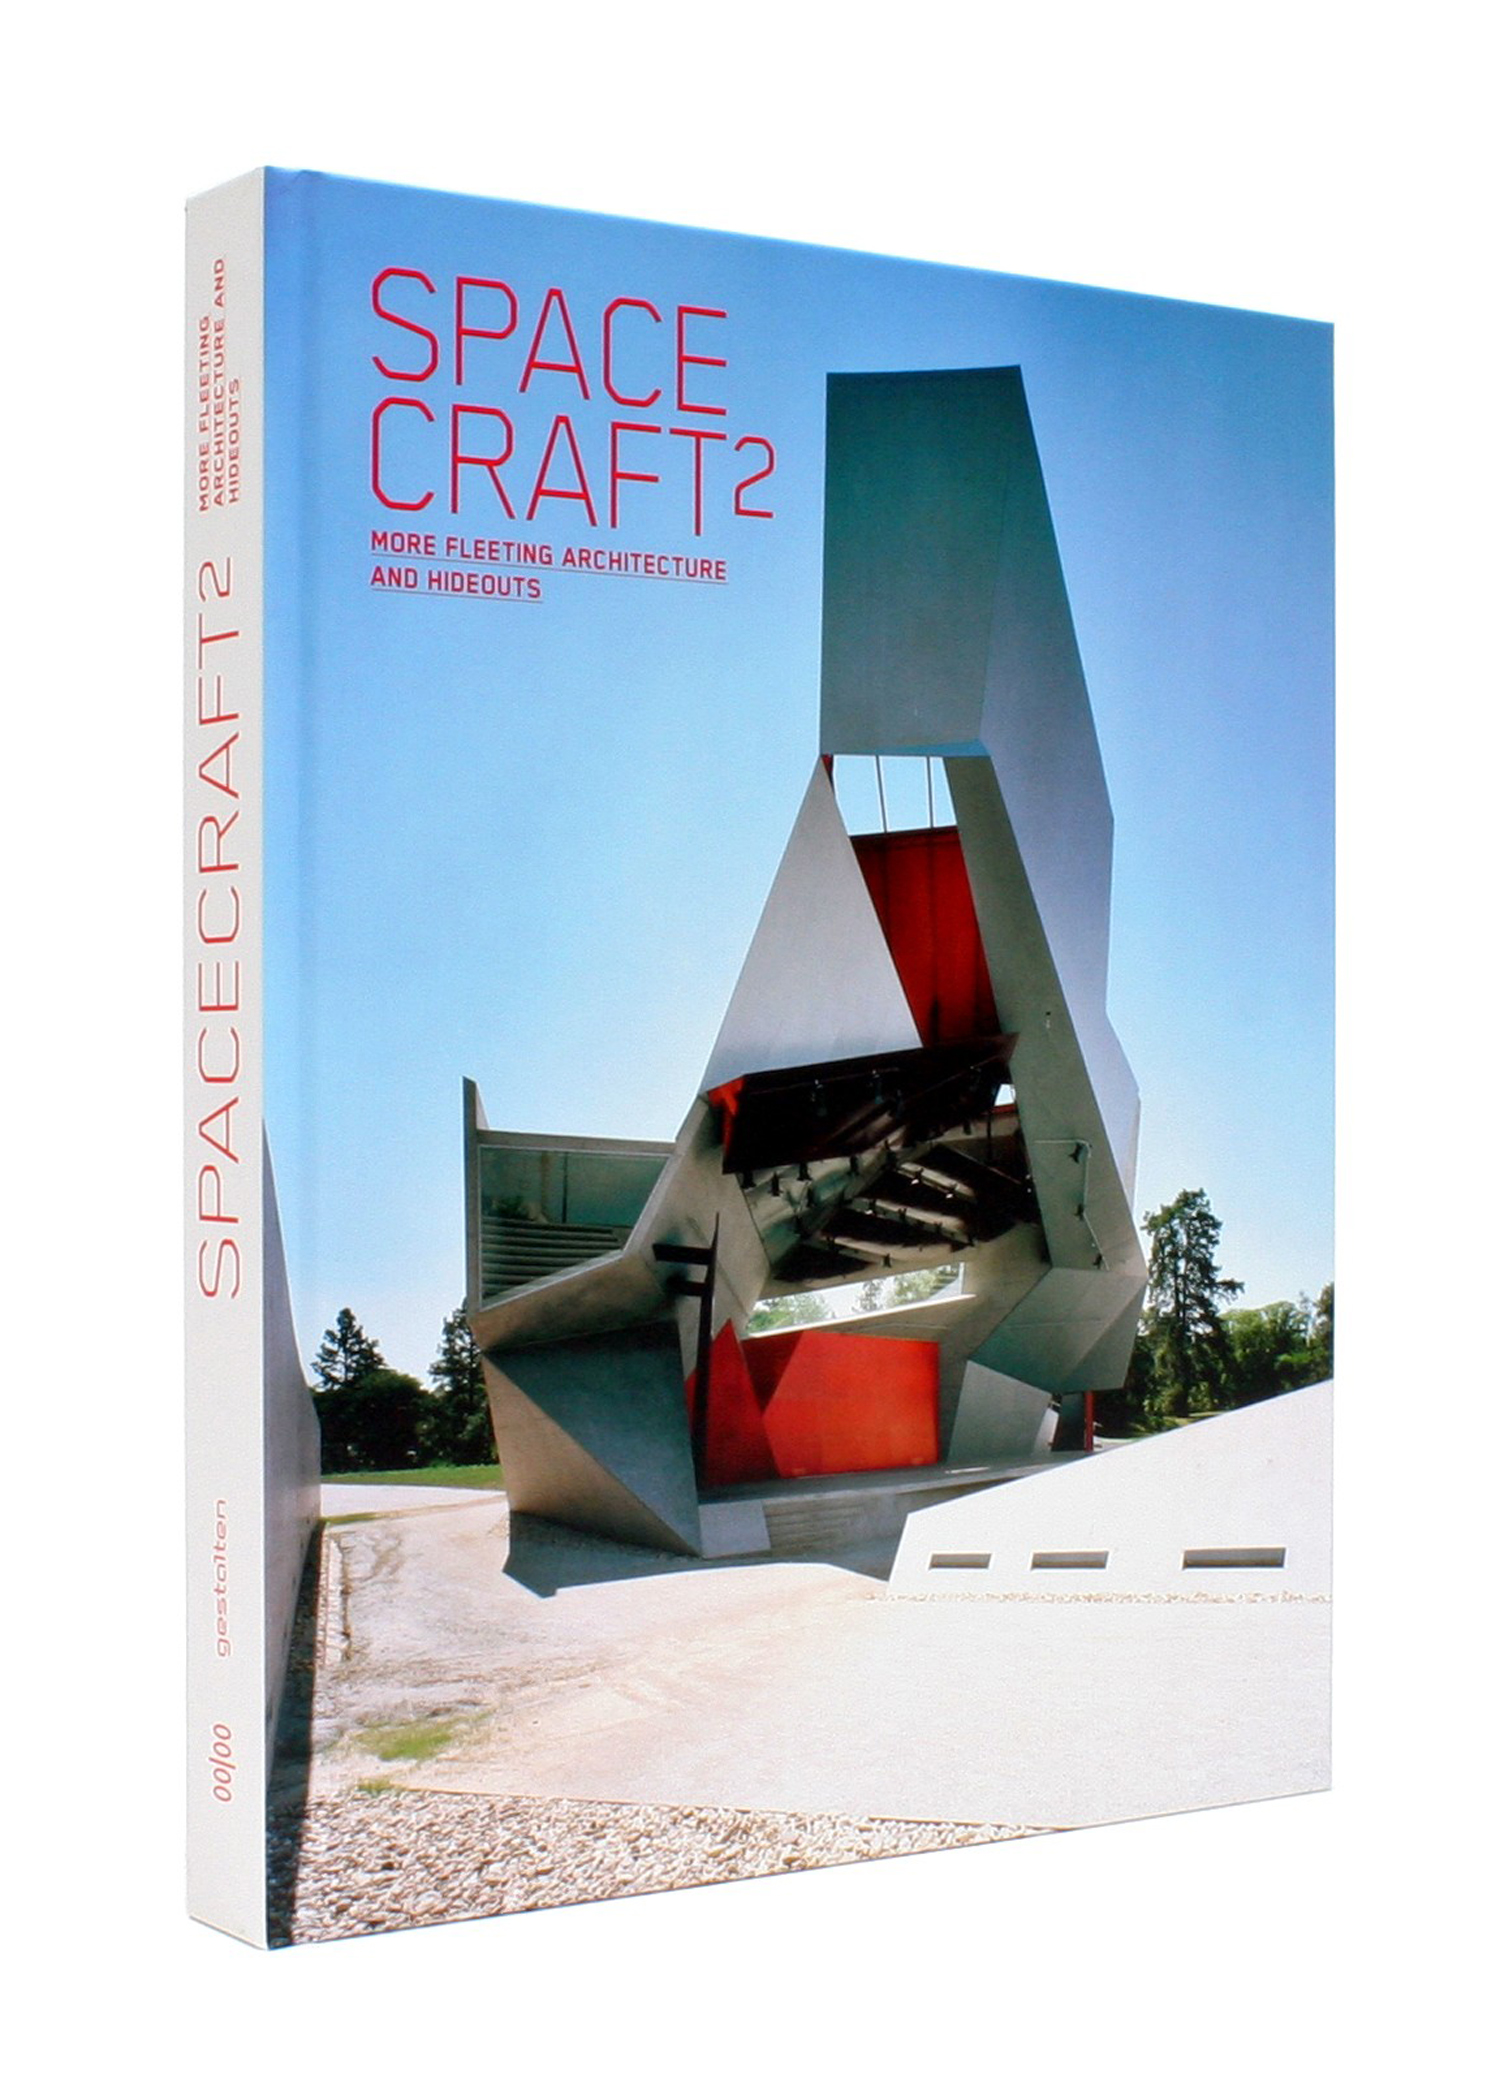 R. Klanten, L. Feireiss, Spacecraft 2: More Fleeting Architecture and Hideouts, Die Gestalten Verkag, Berlin 2009